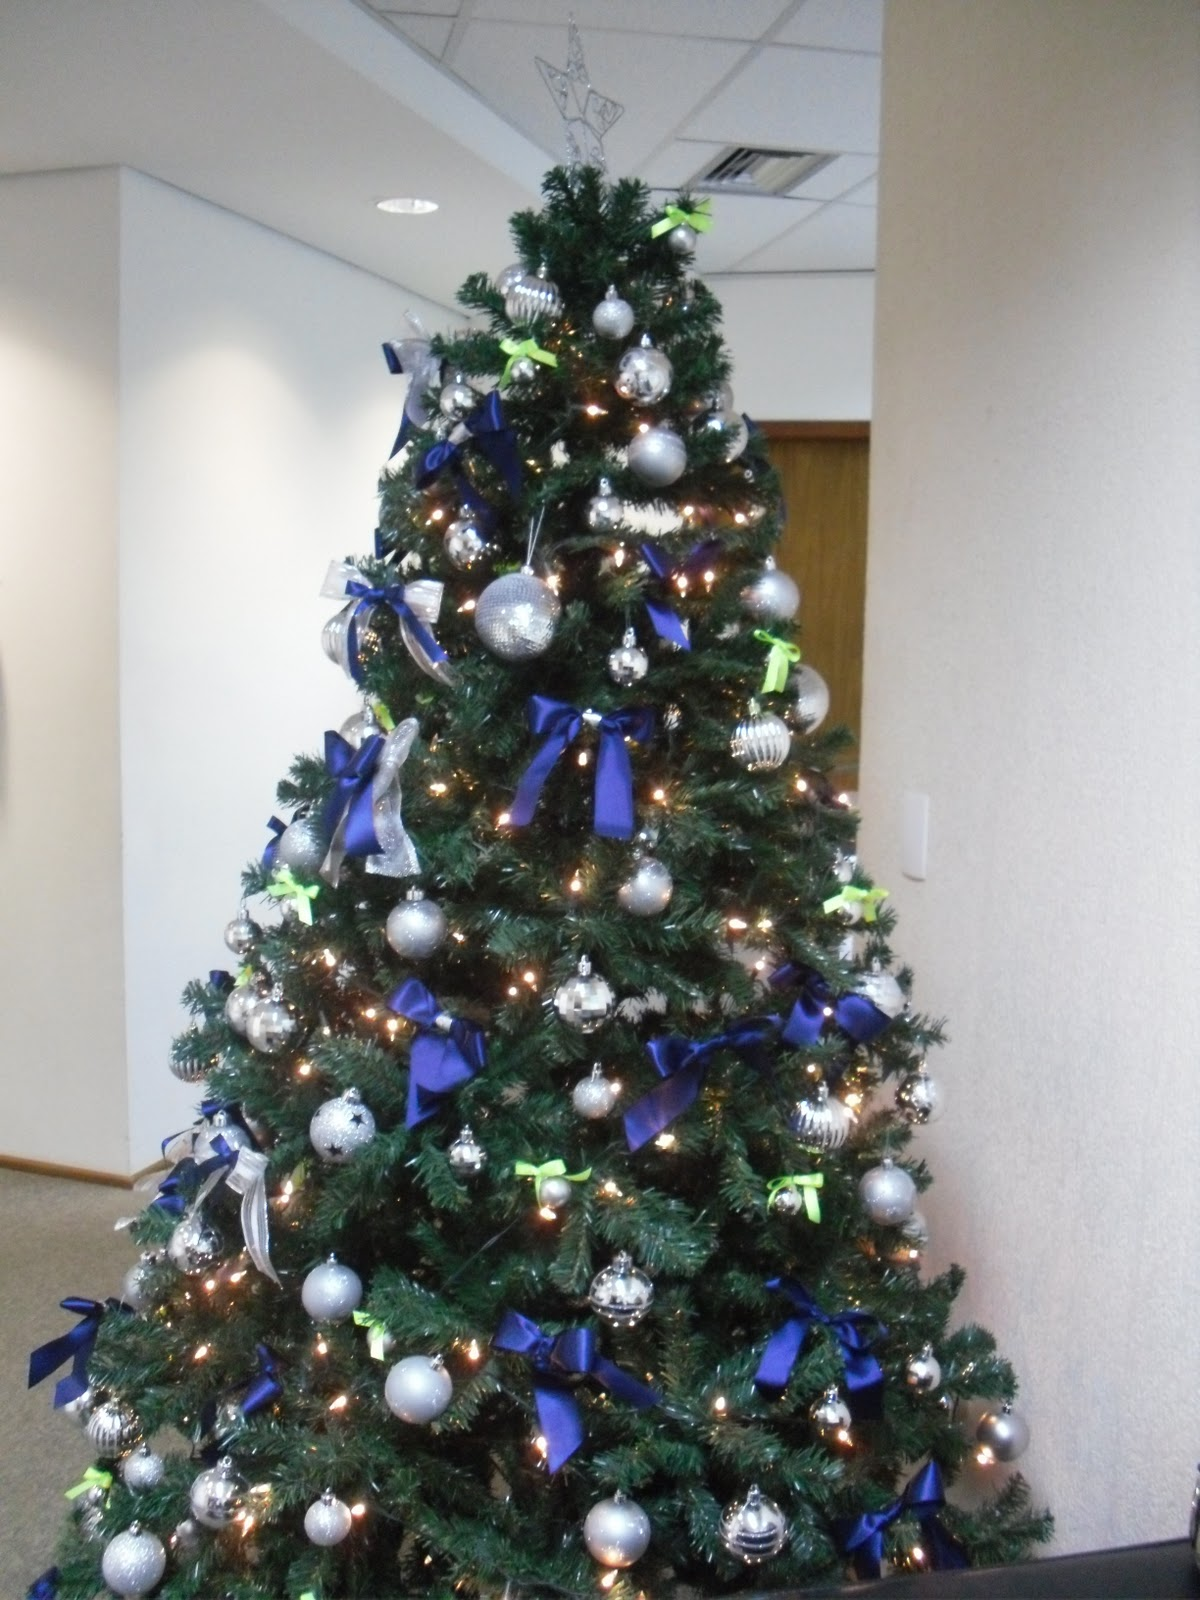 decoracao de arvore de natal azul e prata:essa foi a árvore de natal que montamos para a empresa deloitte foi